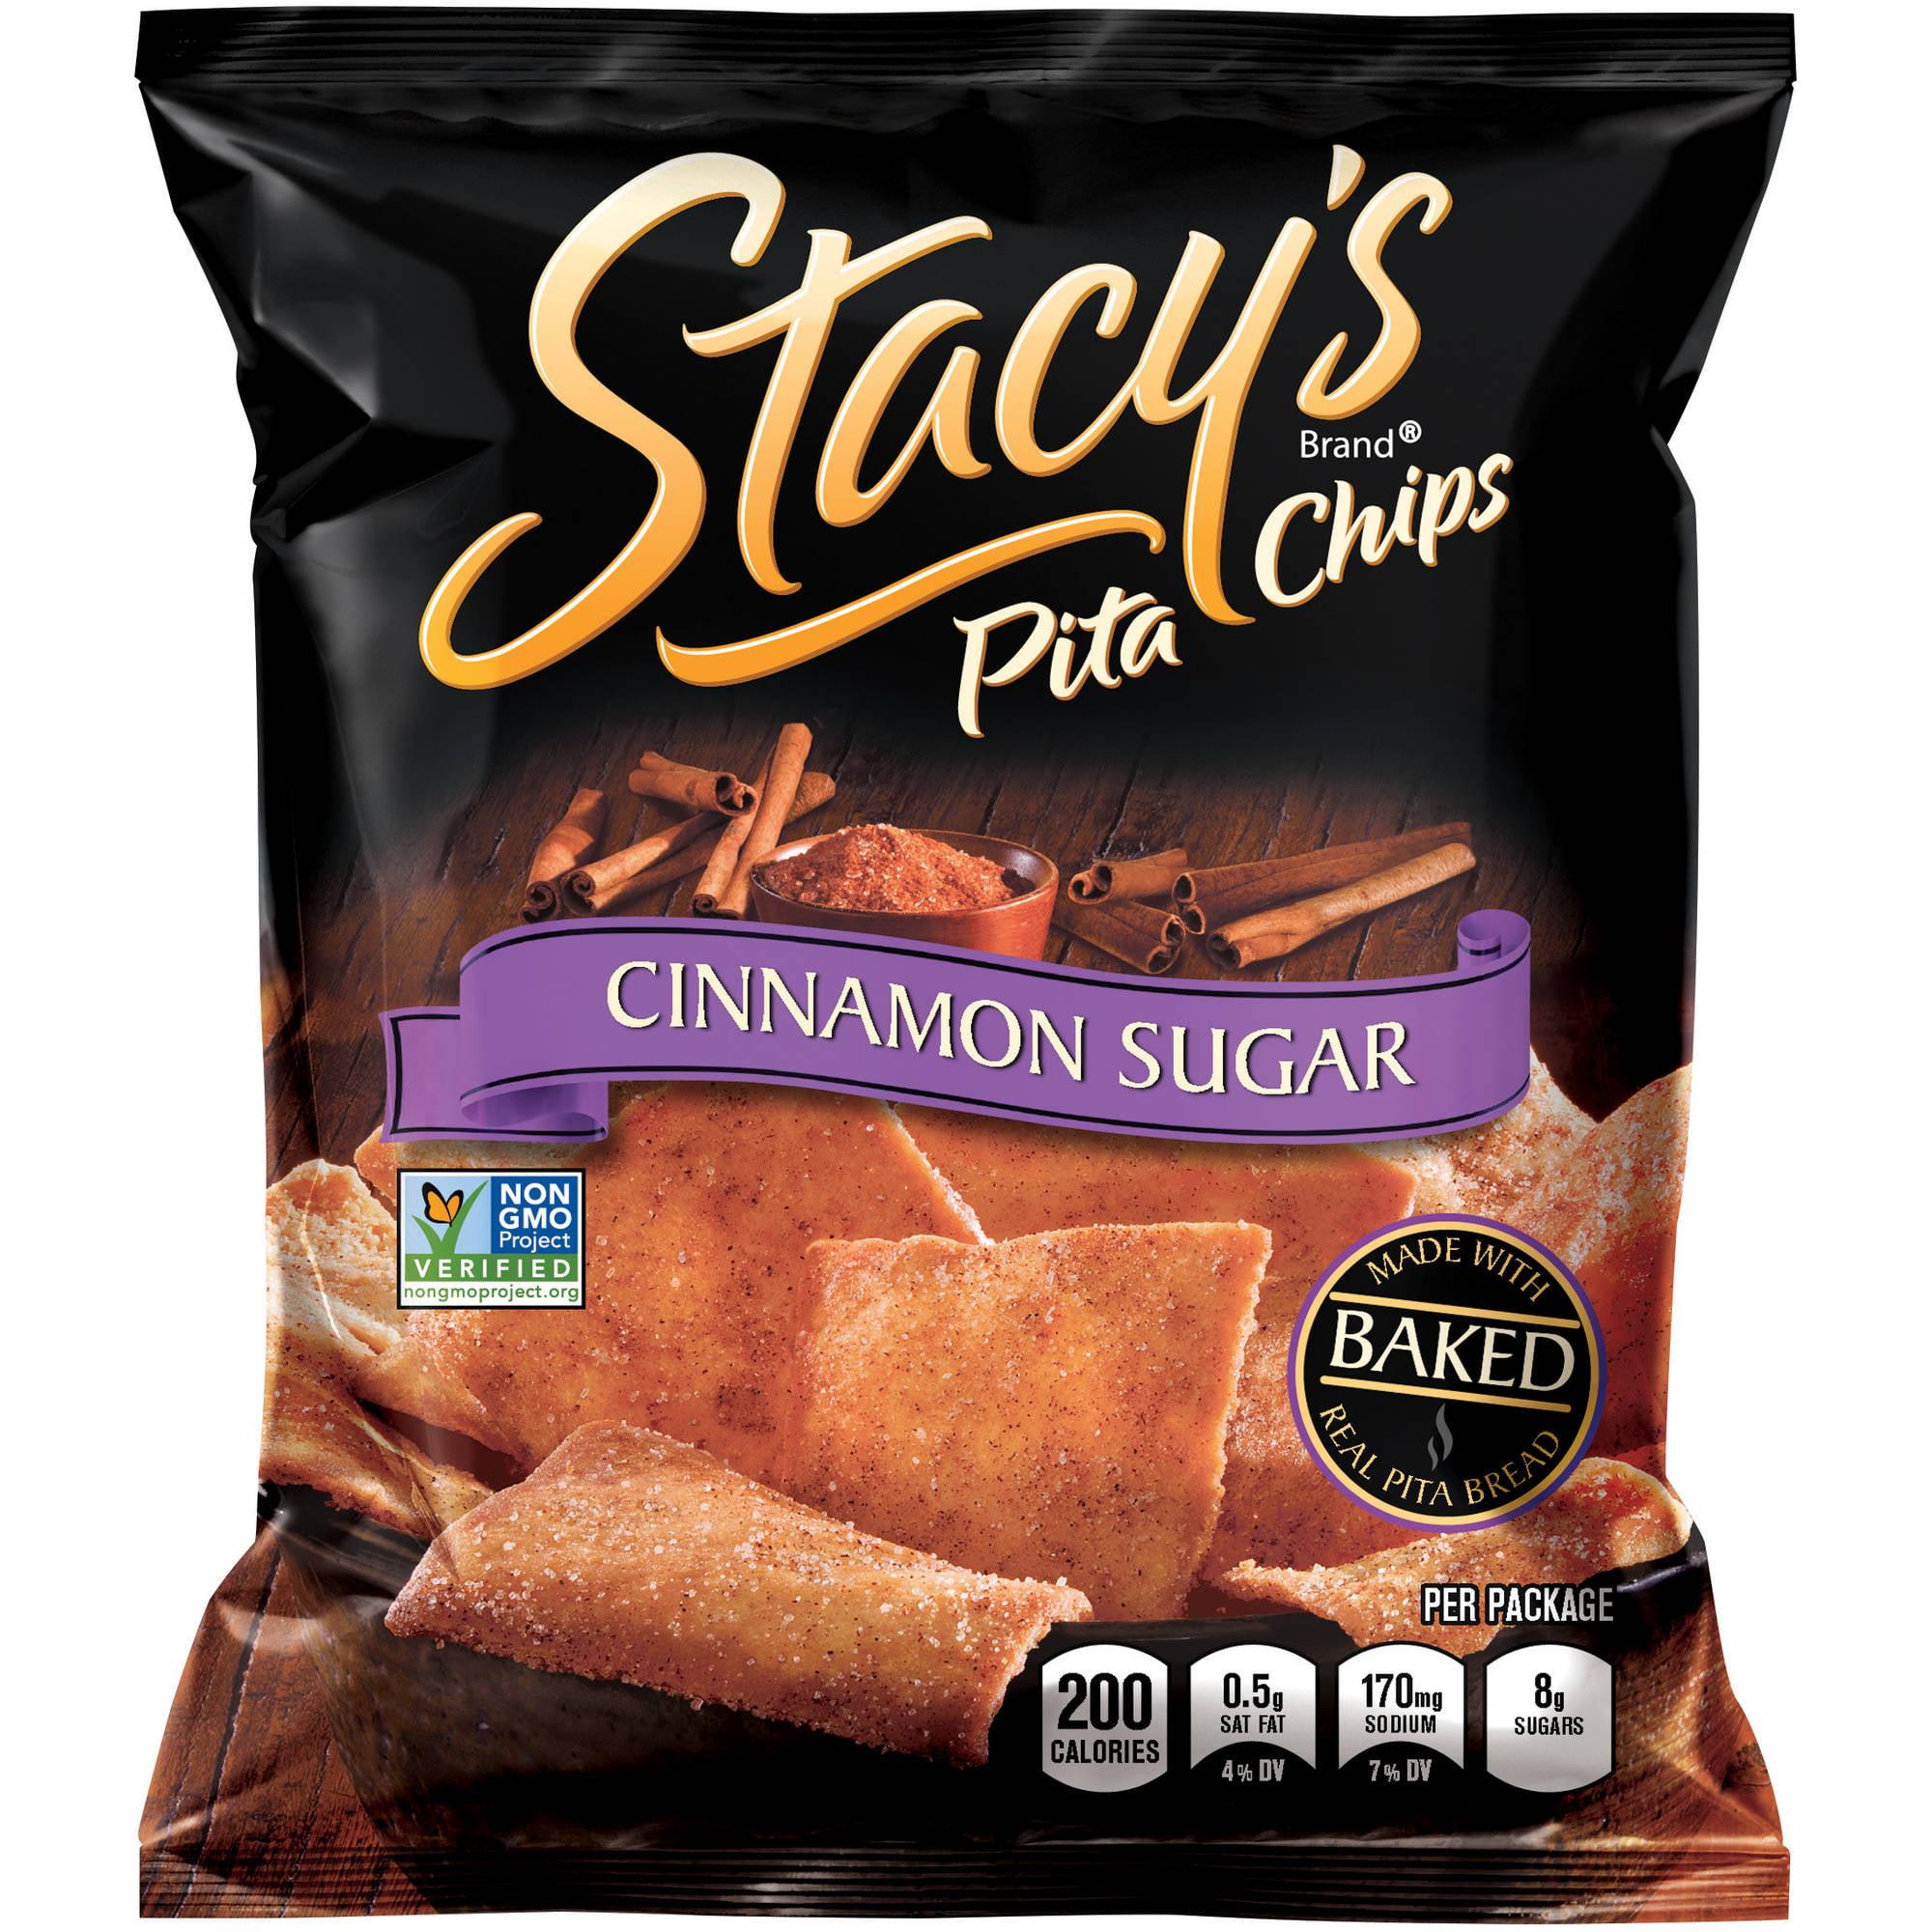 Frito - Lay Stacy's Cinnamon Sugar Pita Chips, 1.5 oz, 24 count